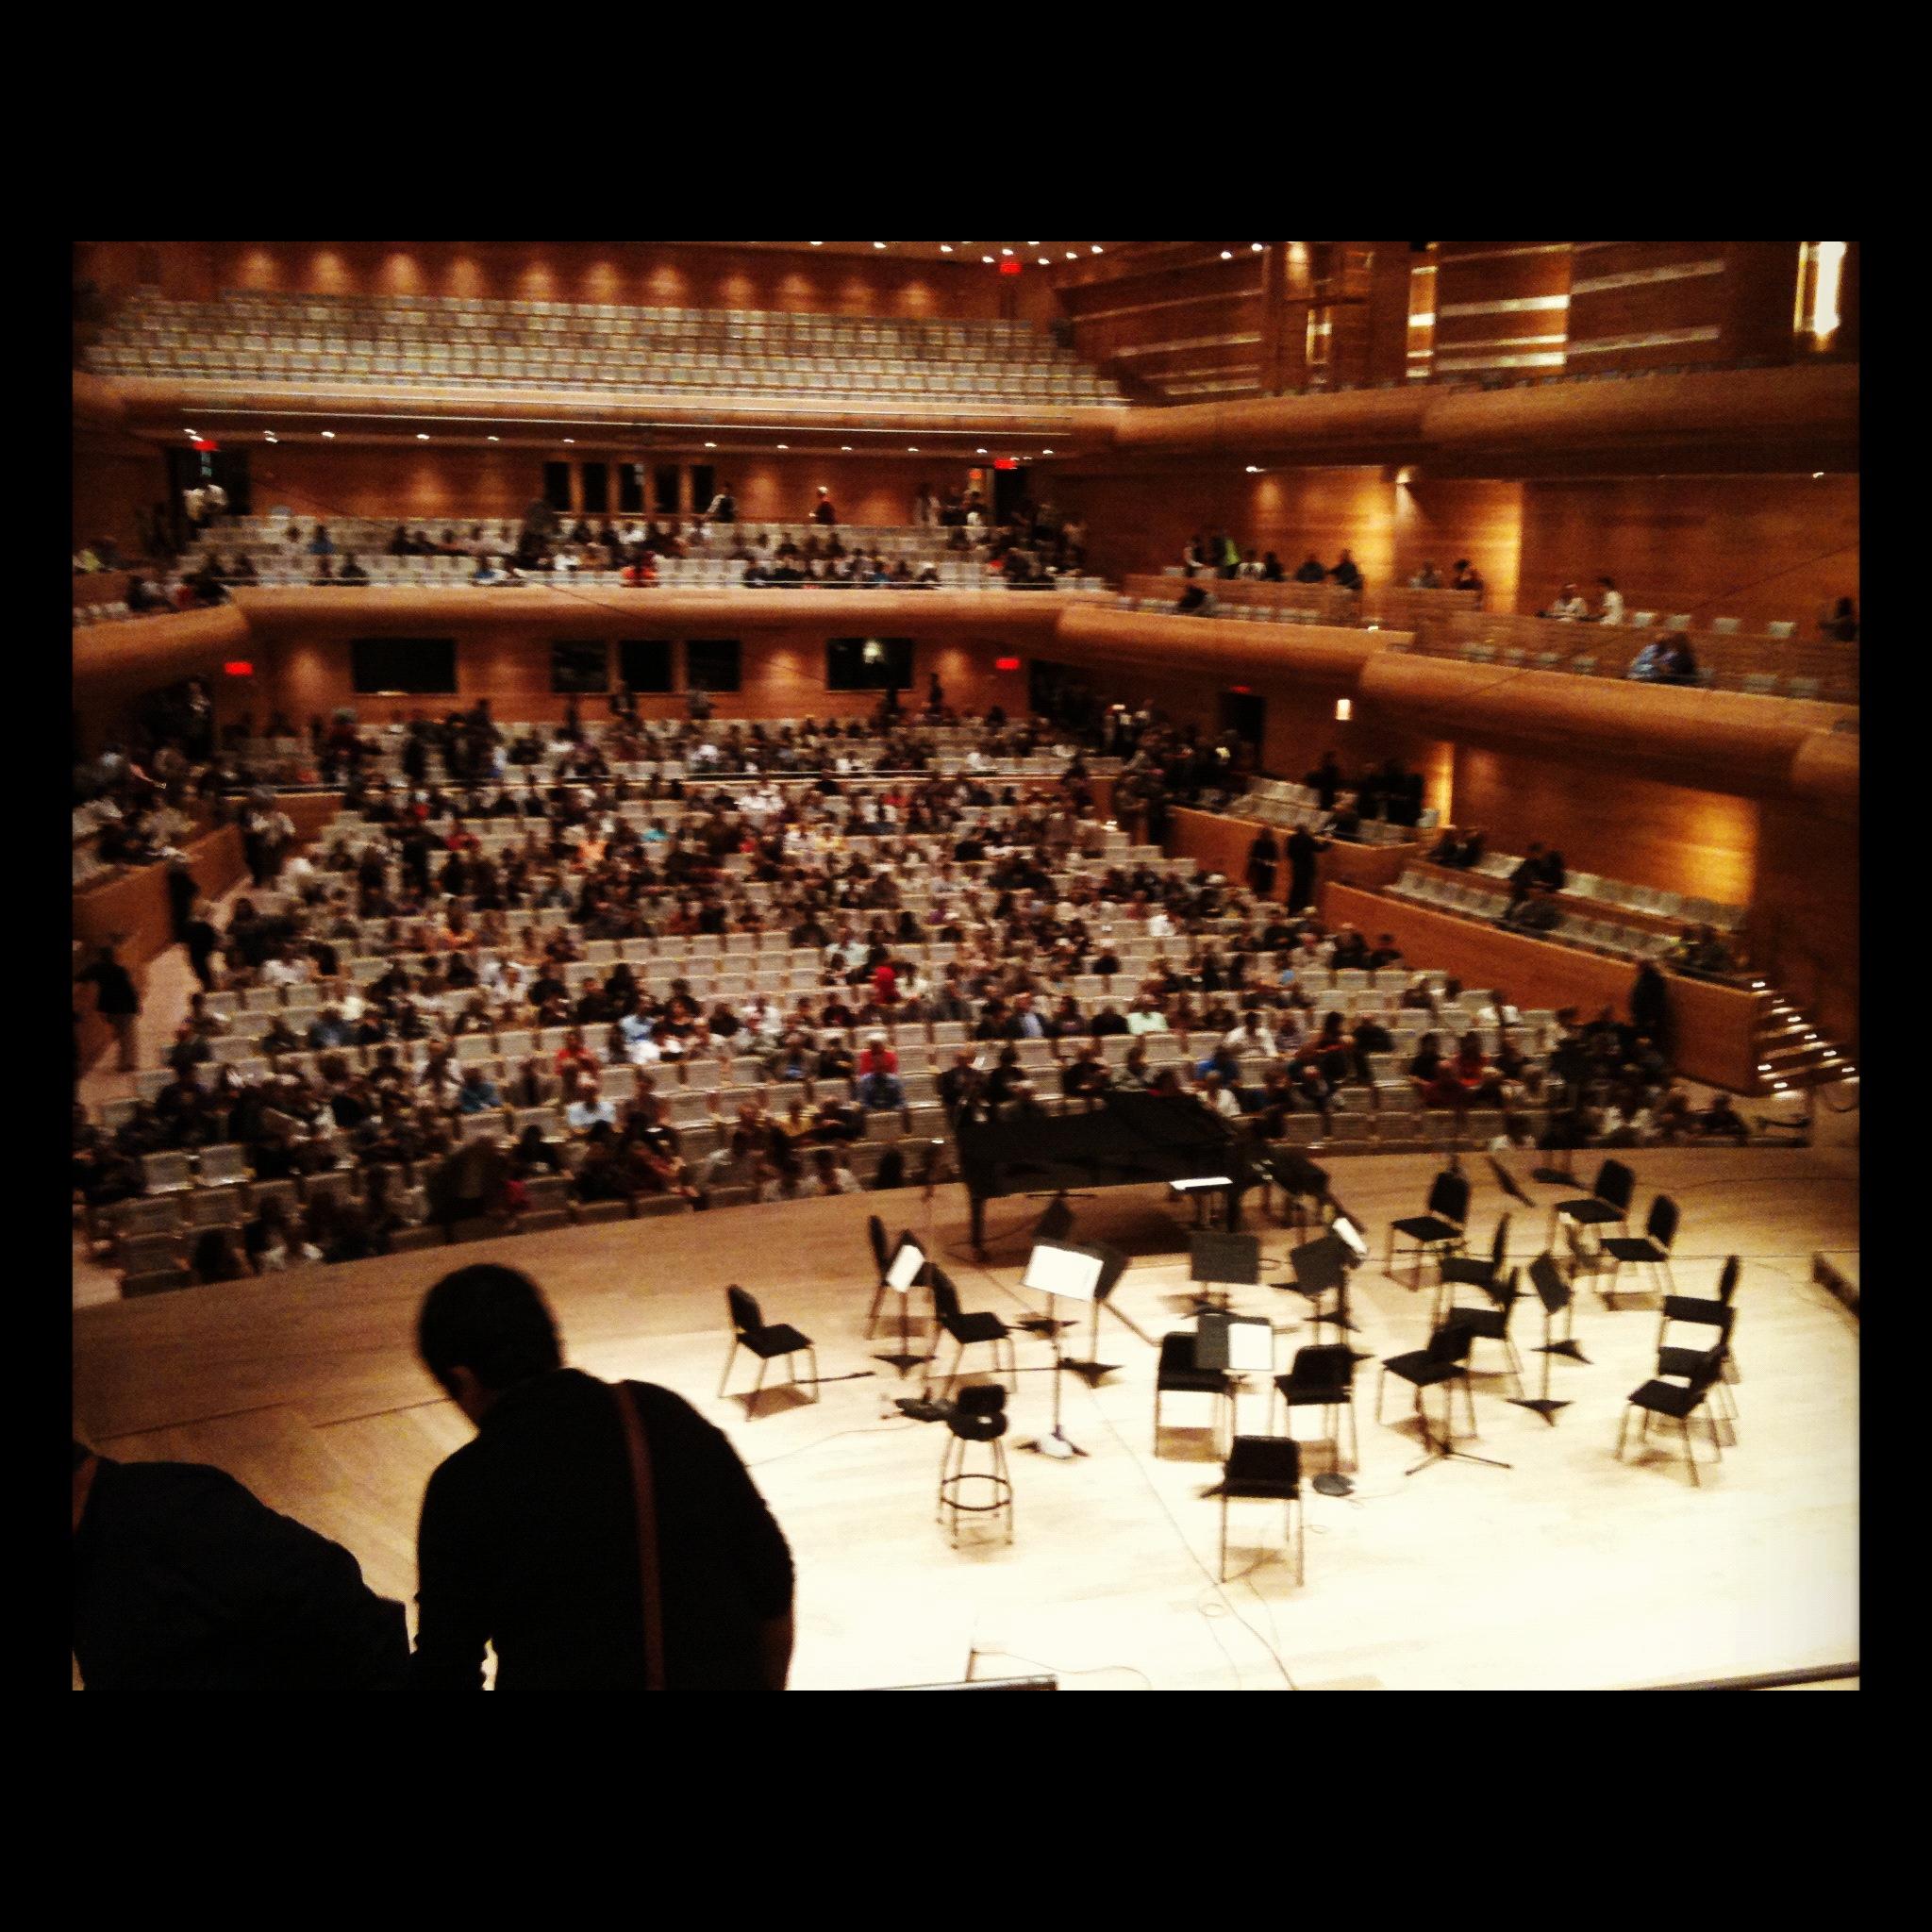 From the choir, Maison Symphonique, Montreal